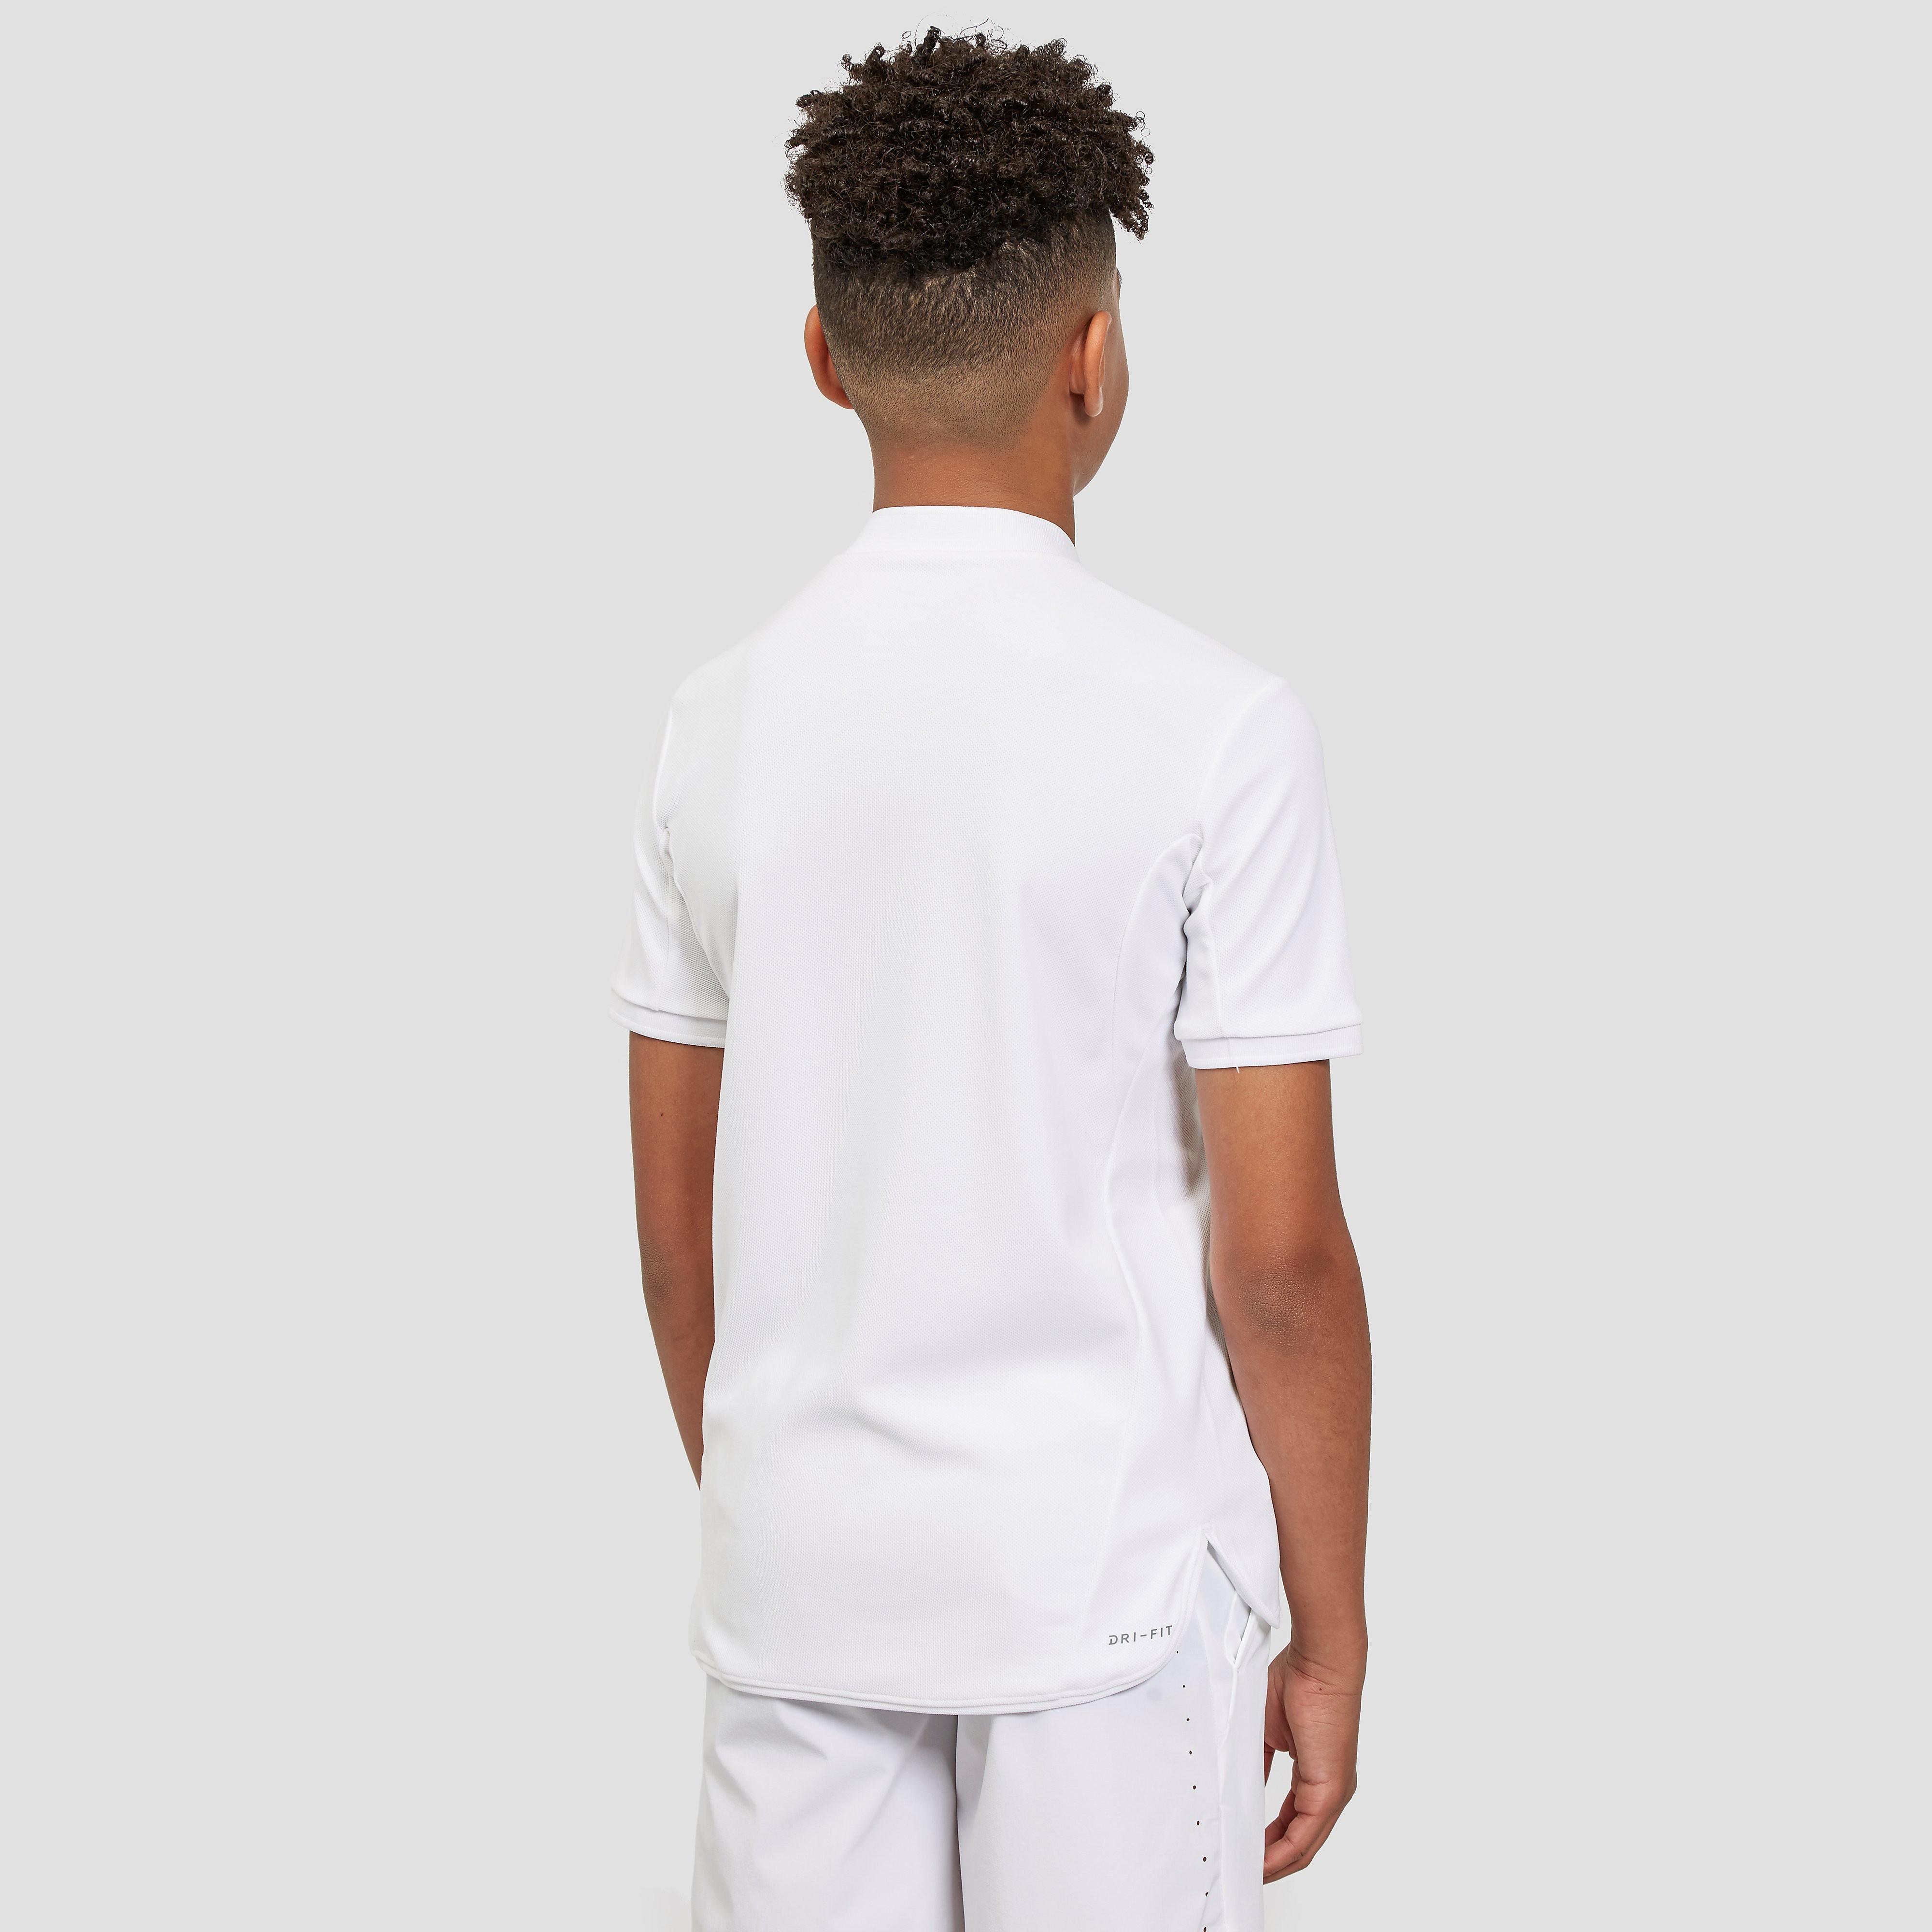 Nike Junior Polo SS T-shirt